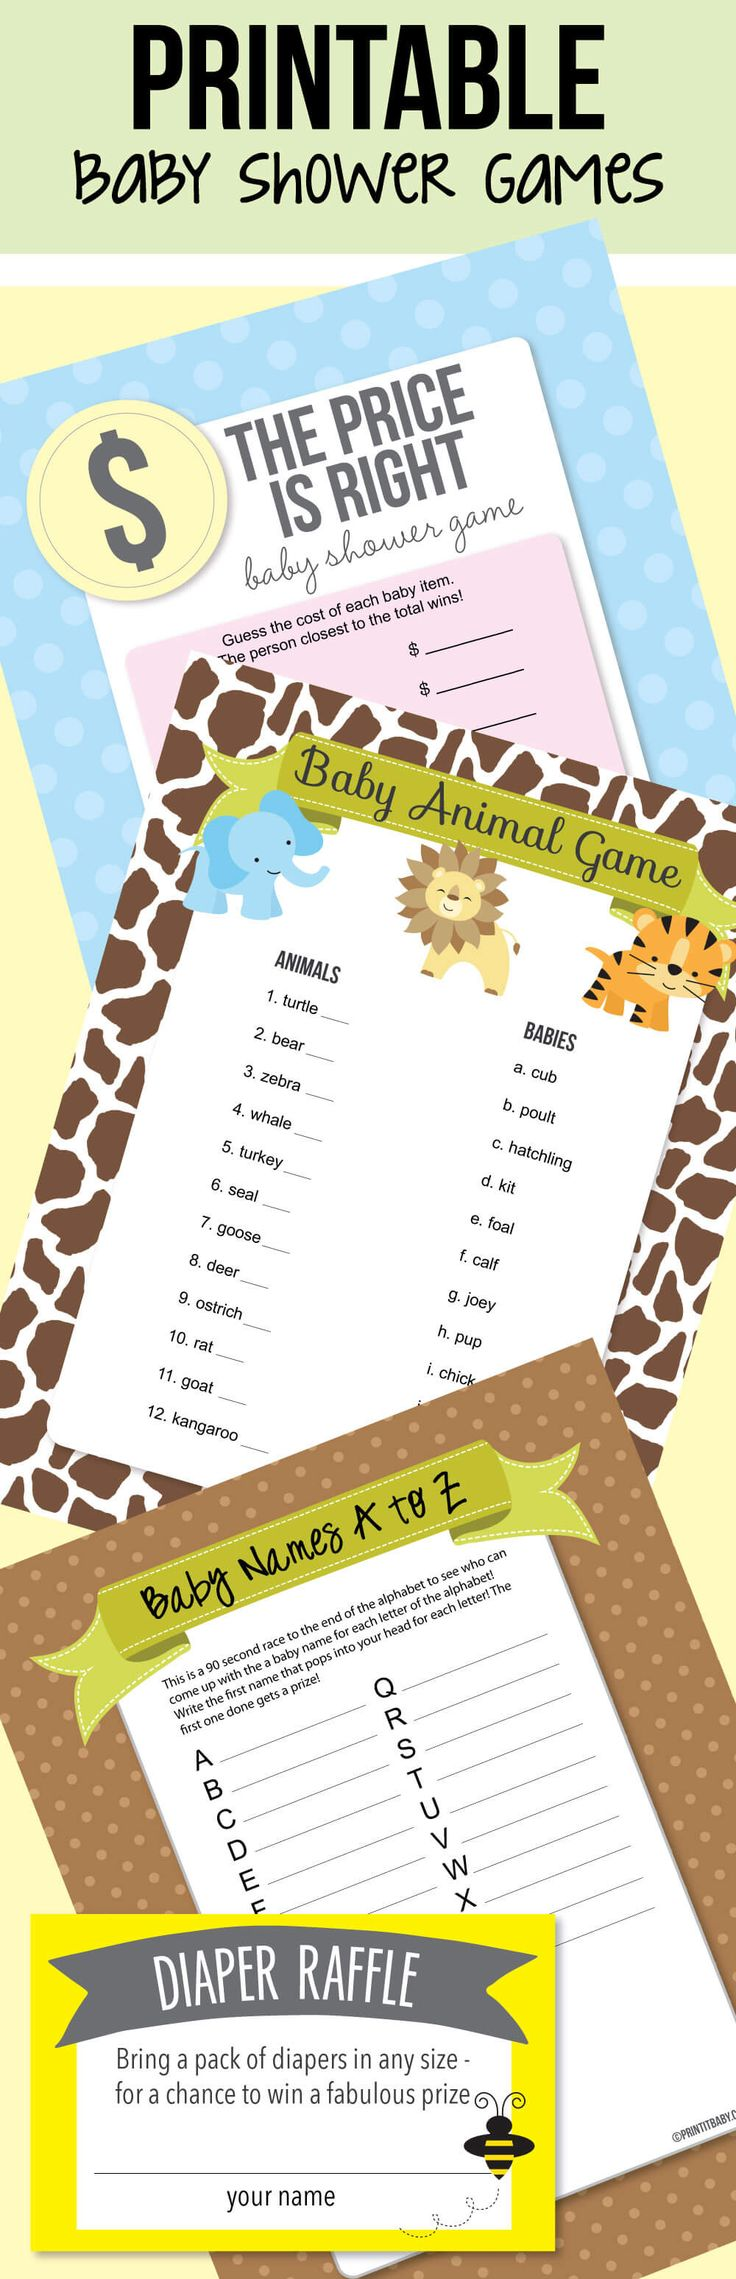 The best Printable Baby Shower Games - coed baby shower games, diaper raffle, word scramble, baby shower bingo...